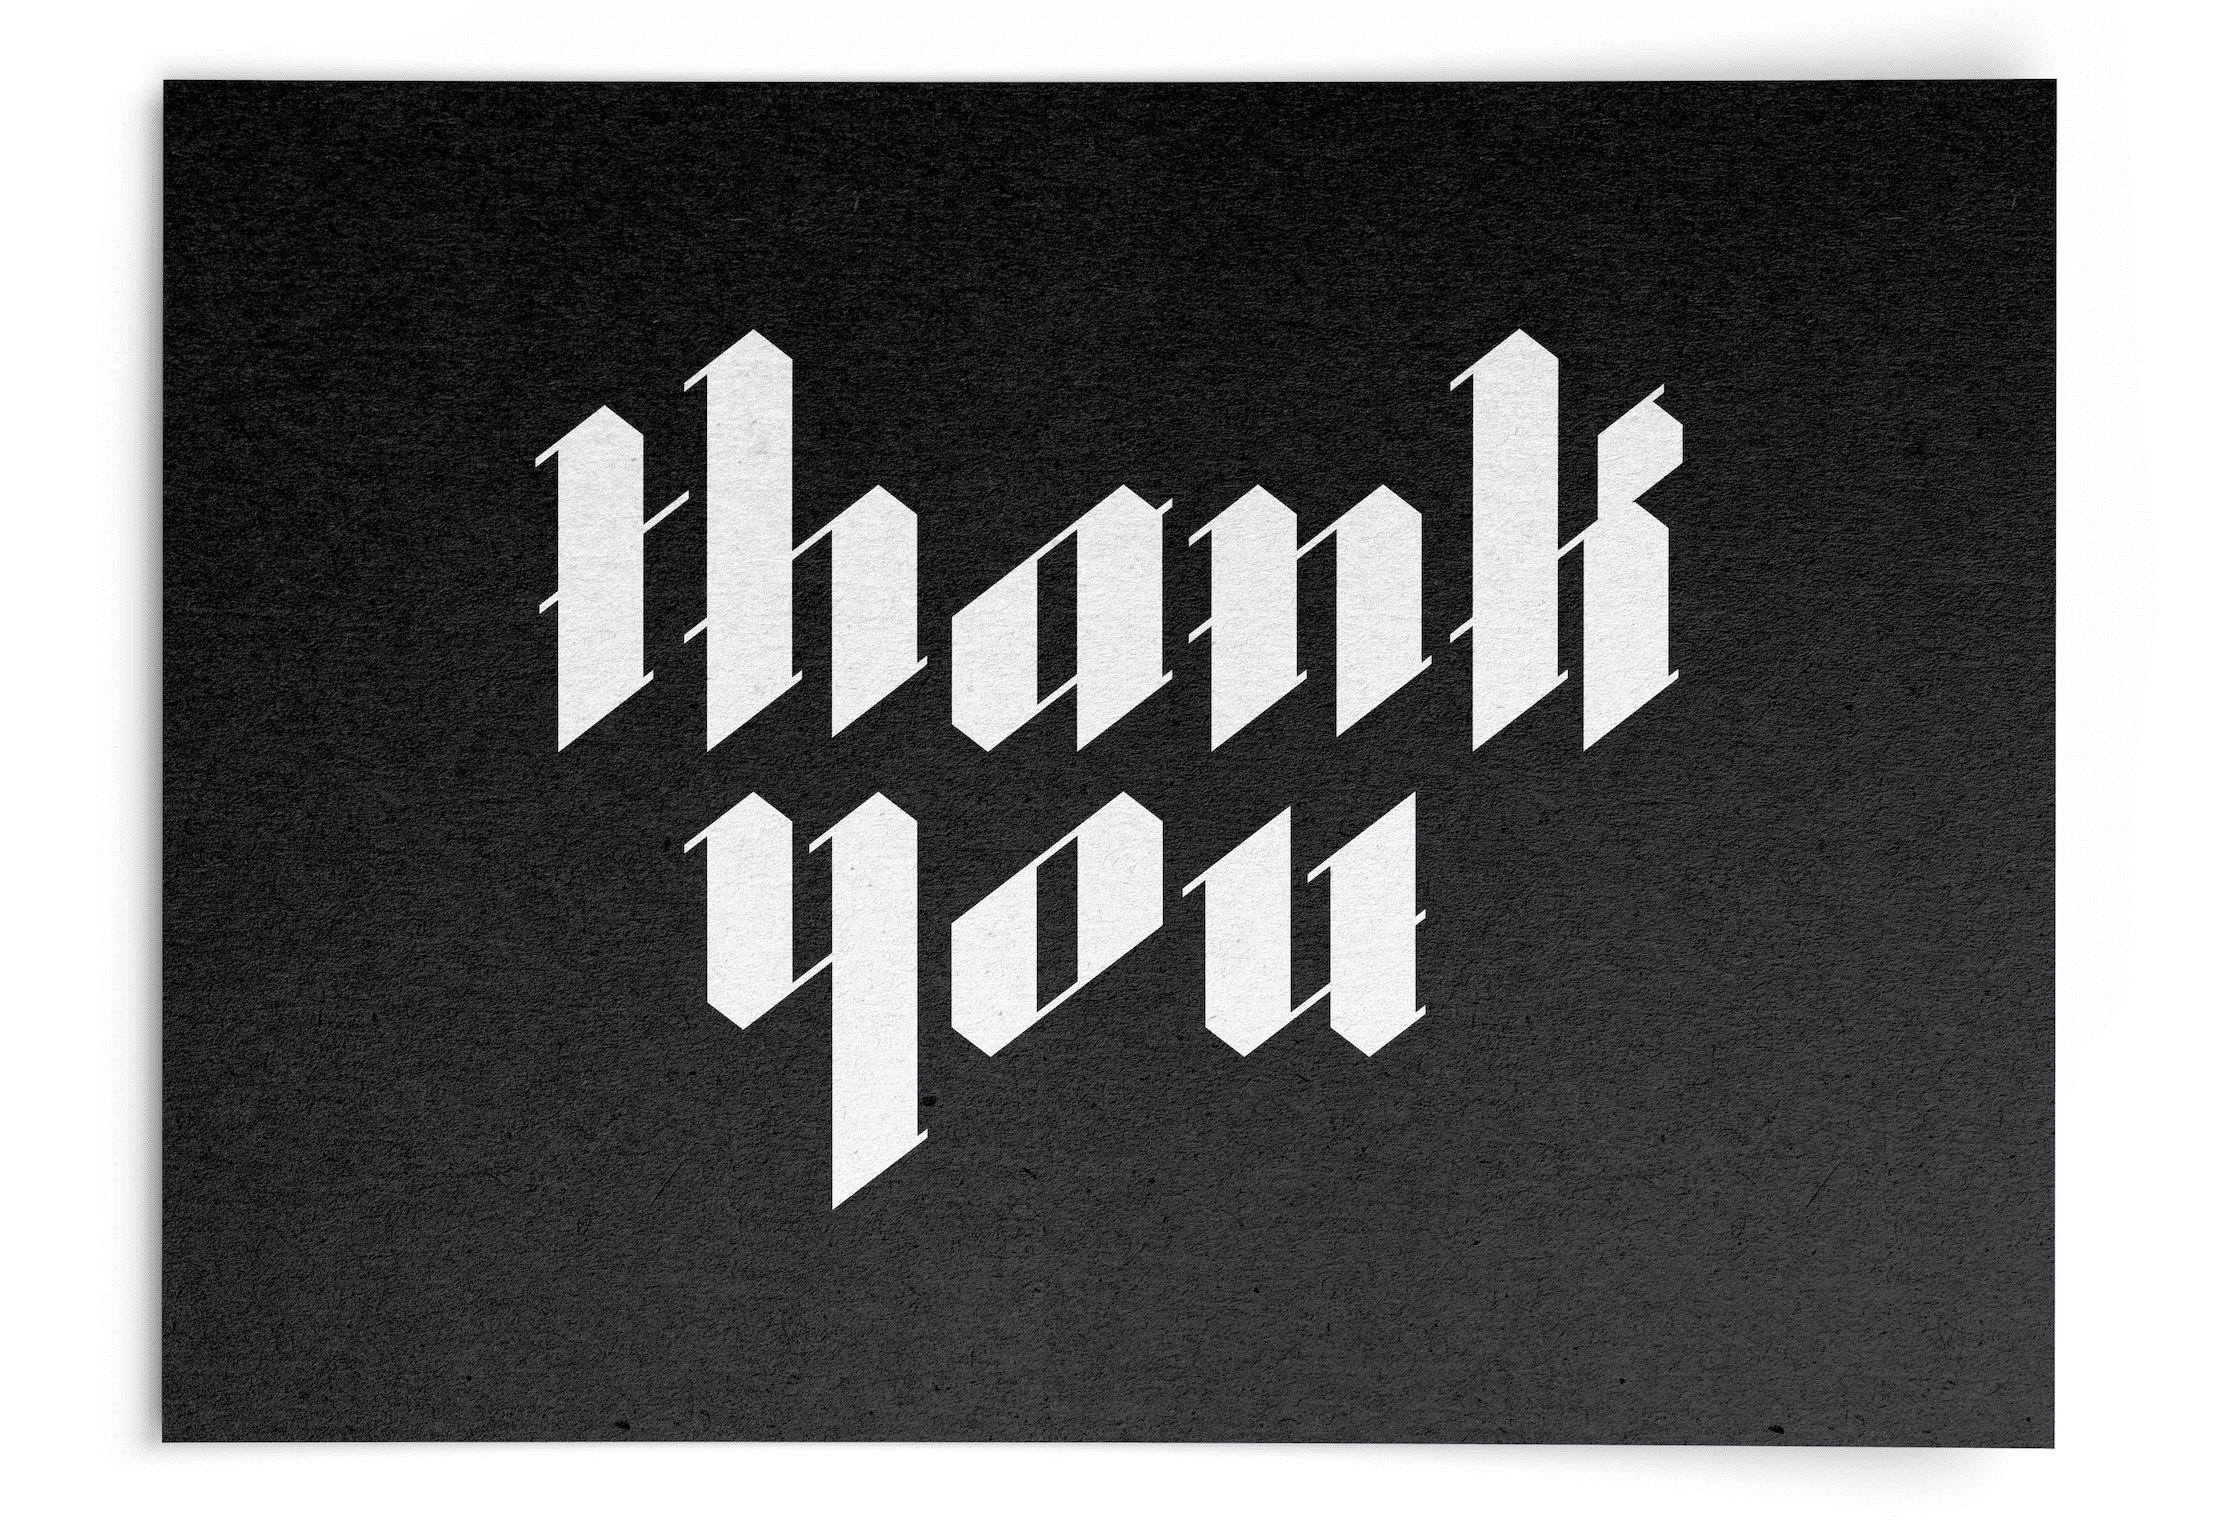 thank_horizontal